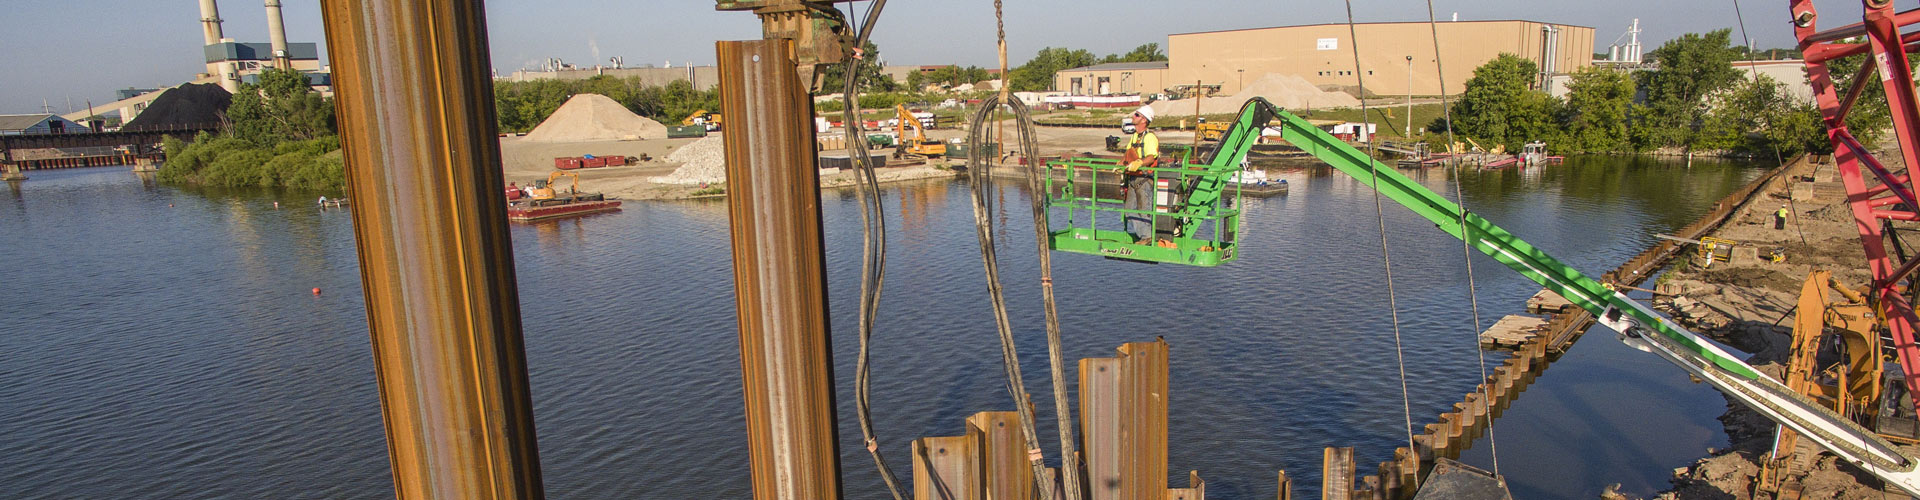 dock construction, sheet pile walls, industrial docks, pile driving